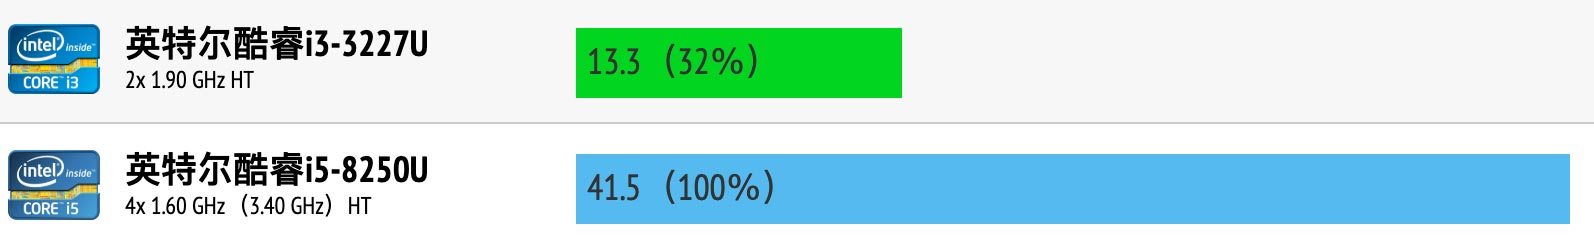 Intel Core i3-3227U和i5-8250U性能跑分对比评测